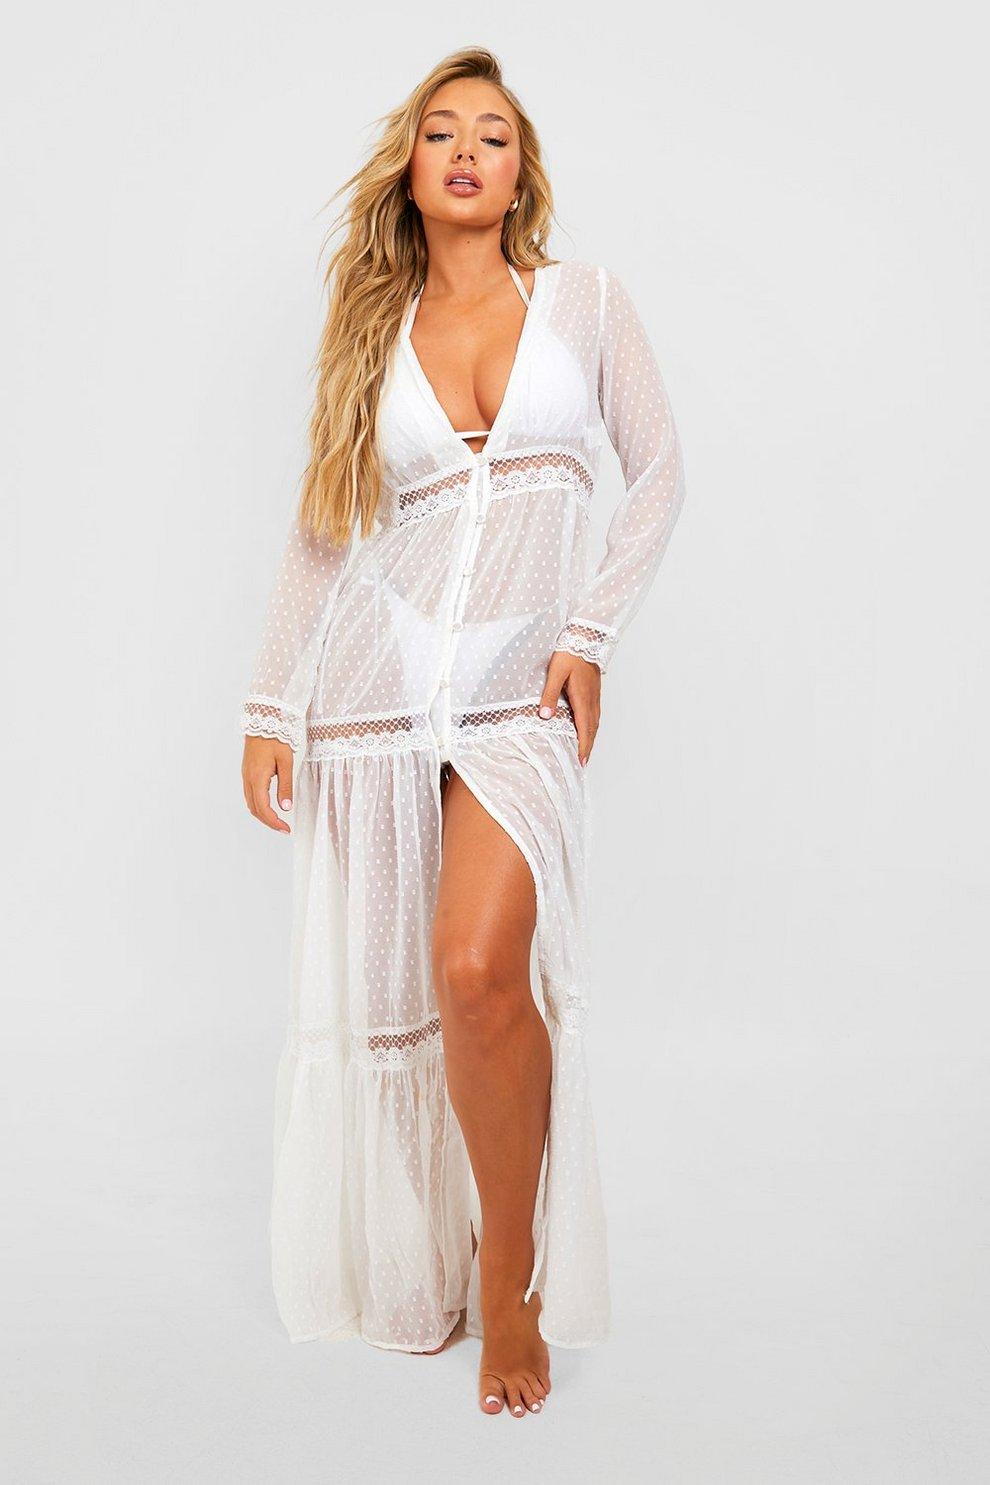 659f10532022 Womens White Boho Lace Beach Dress